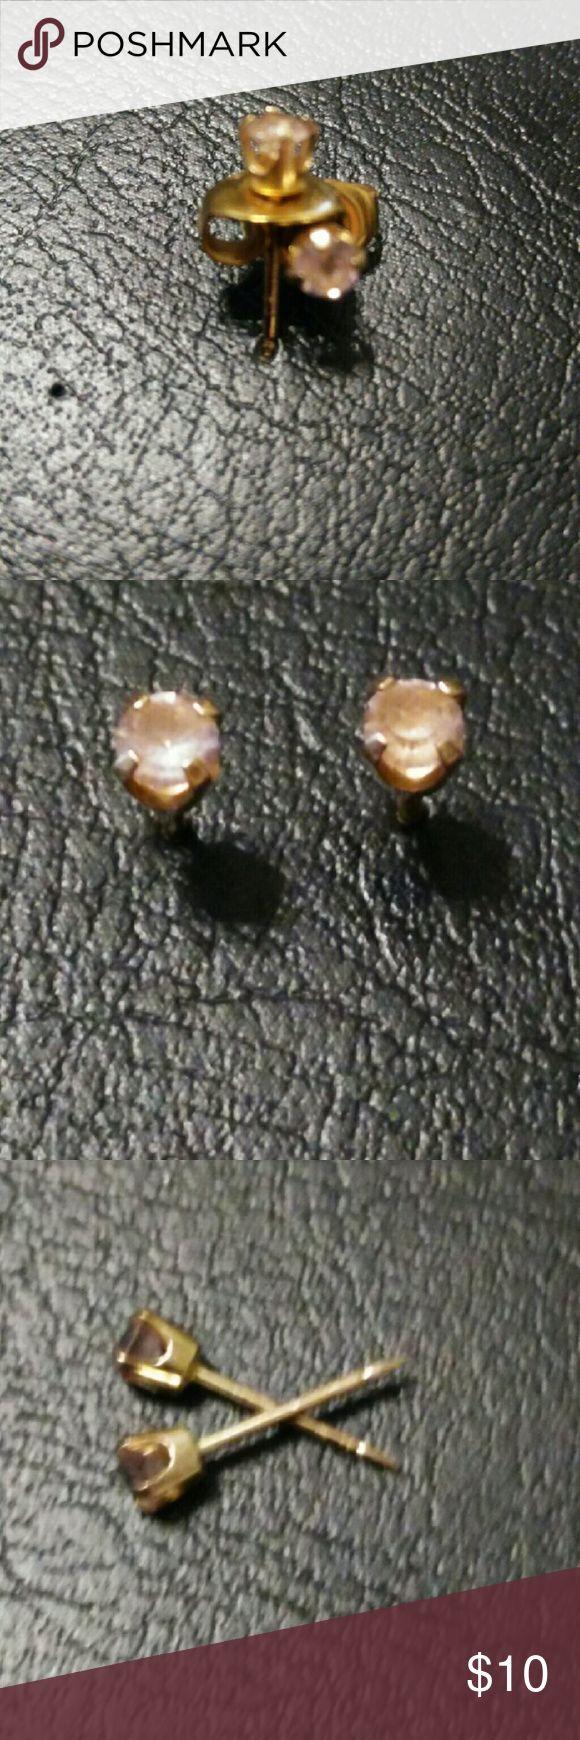 10 karat gold starter earrings Beautiful 10 karat gold starter earrings with Jewelry Earrings